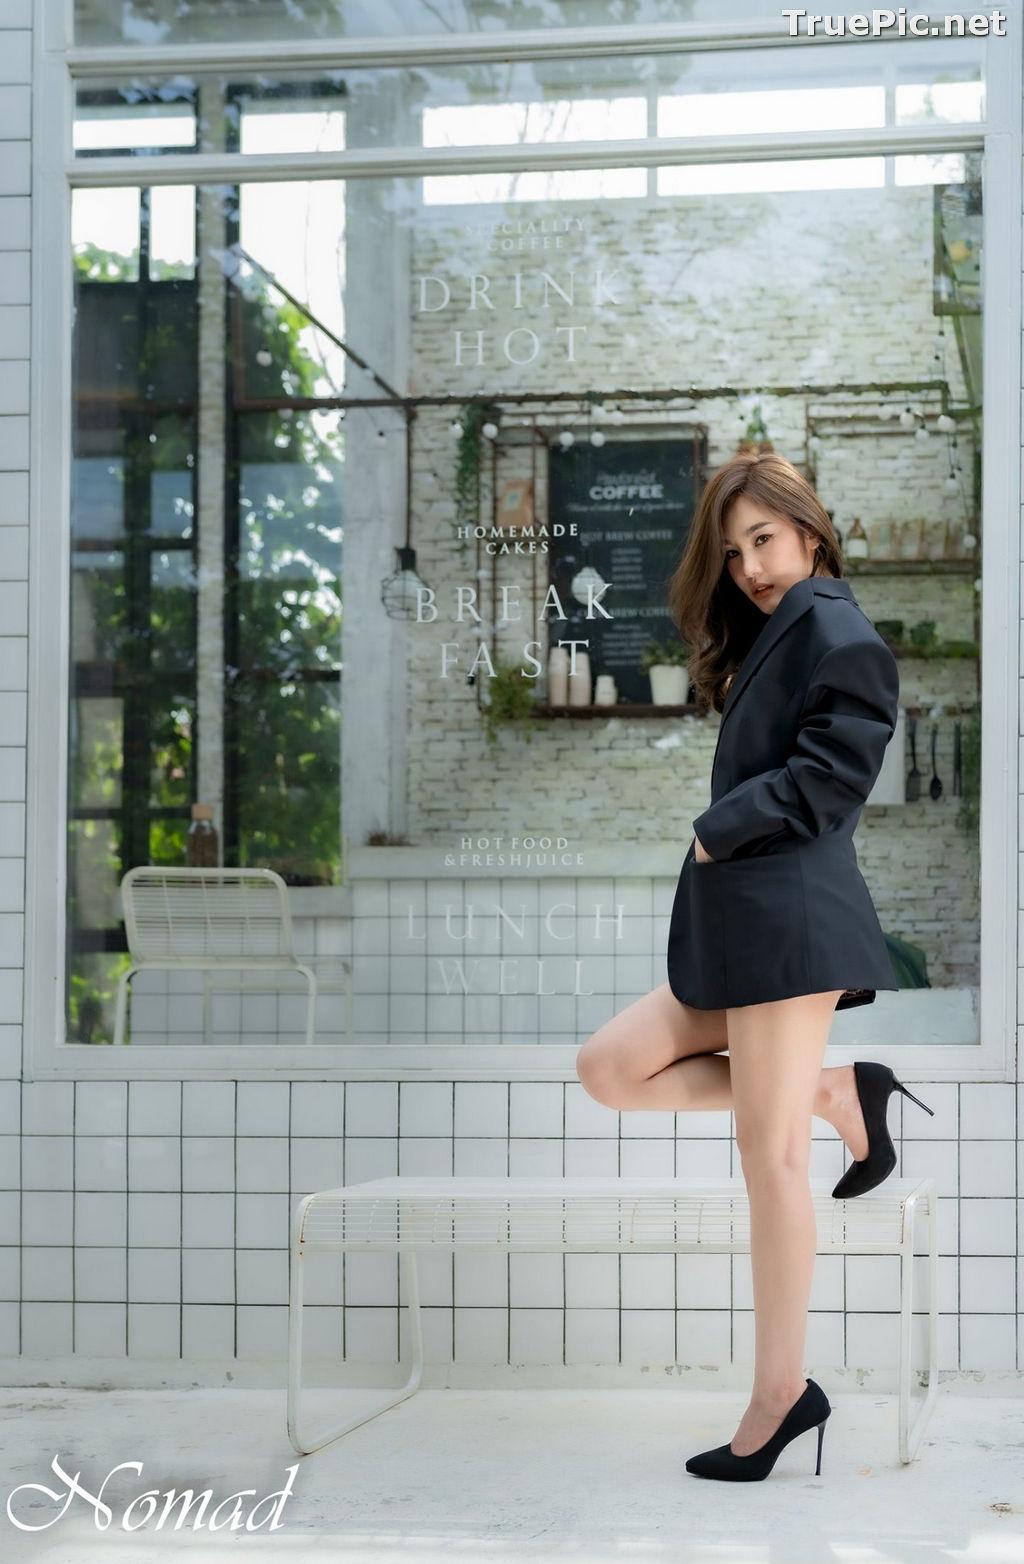 Image Thailand Model - Jarunan Tavepanya - Beautiful In Black and White - TruePic.net - Picture-3